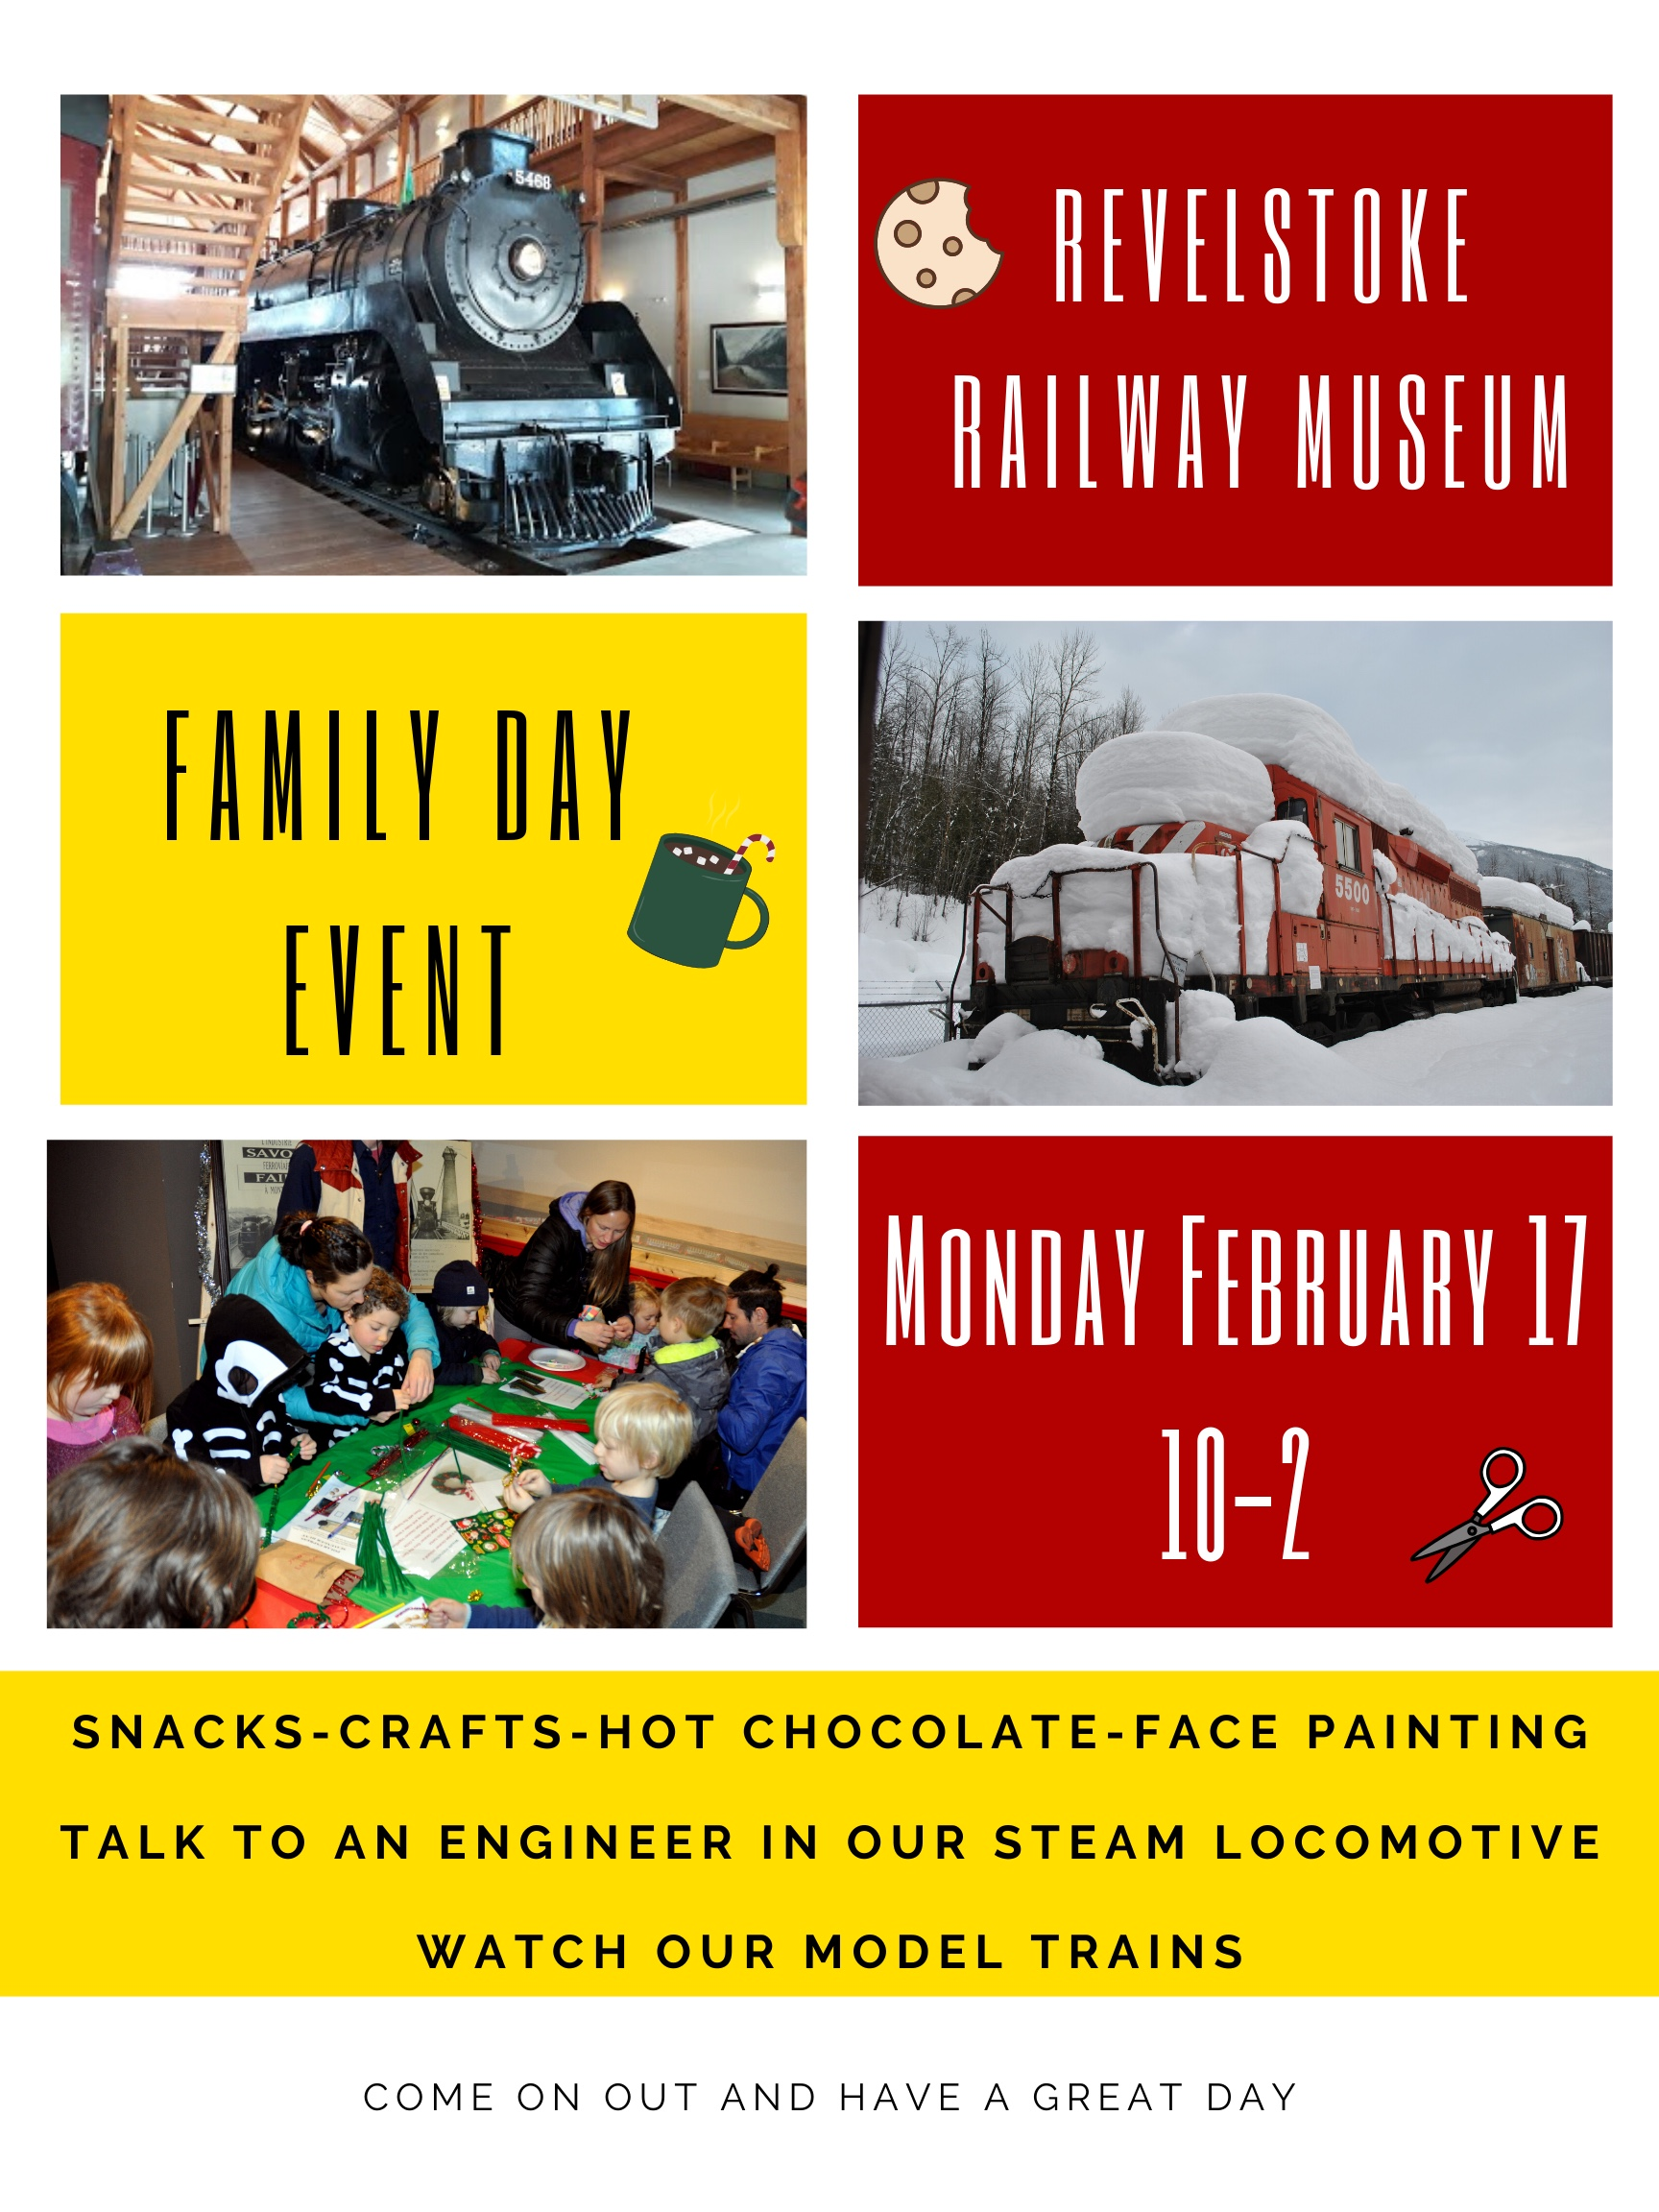 Revelstoke Railway Museum Family Day Event